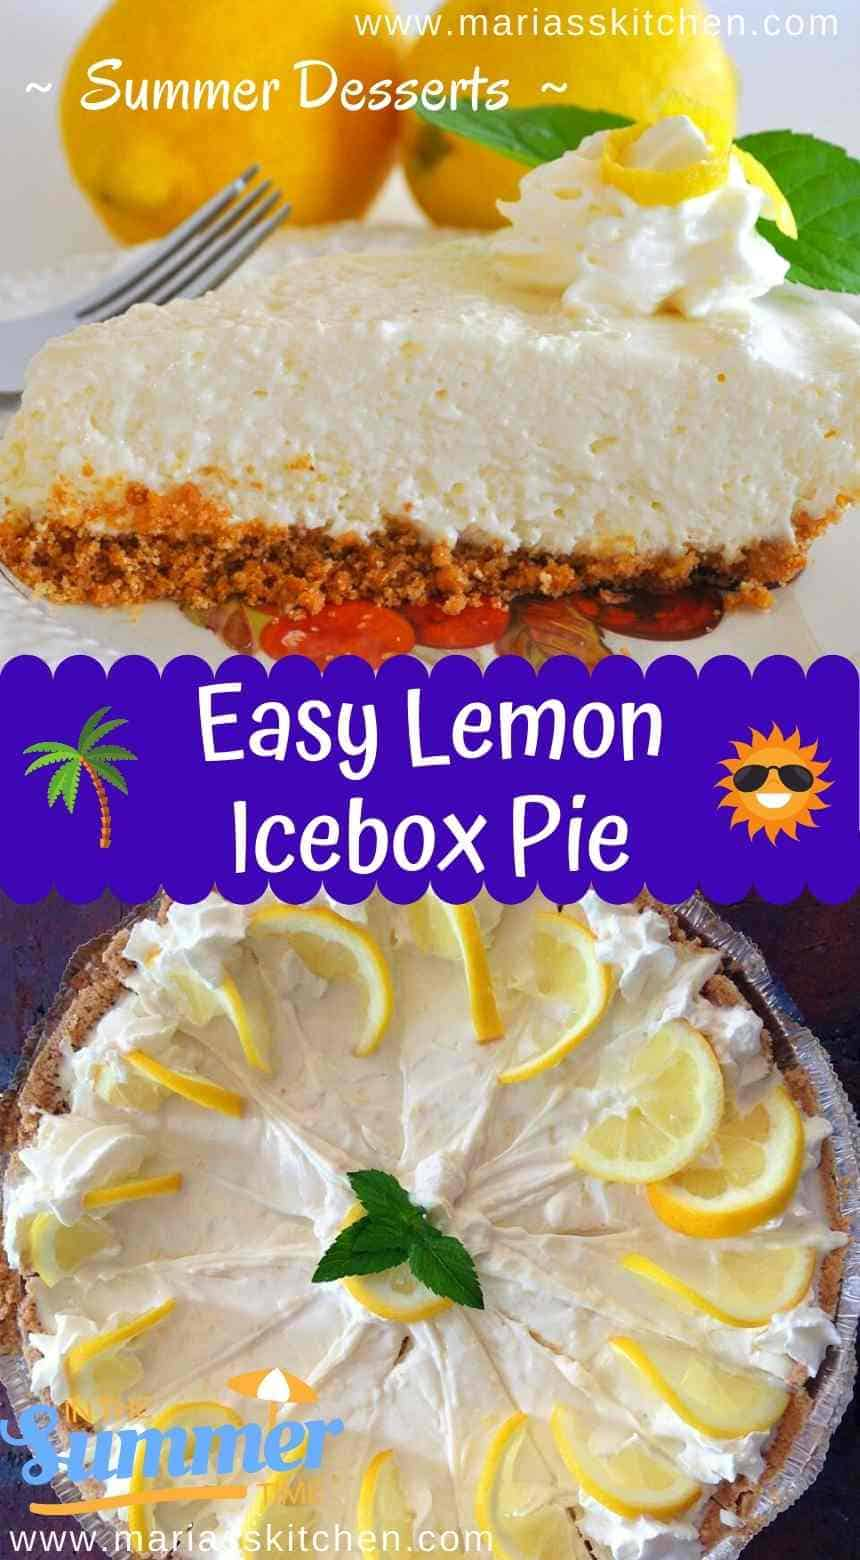 Easy Lemon Icebox Pie - Summer Desserts